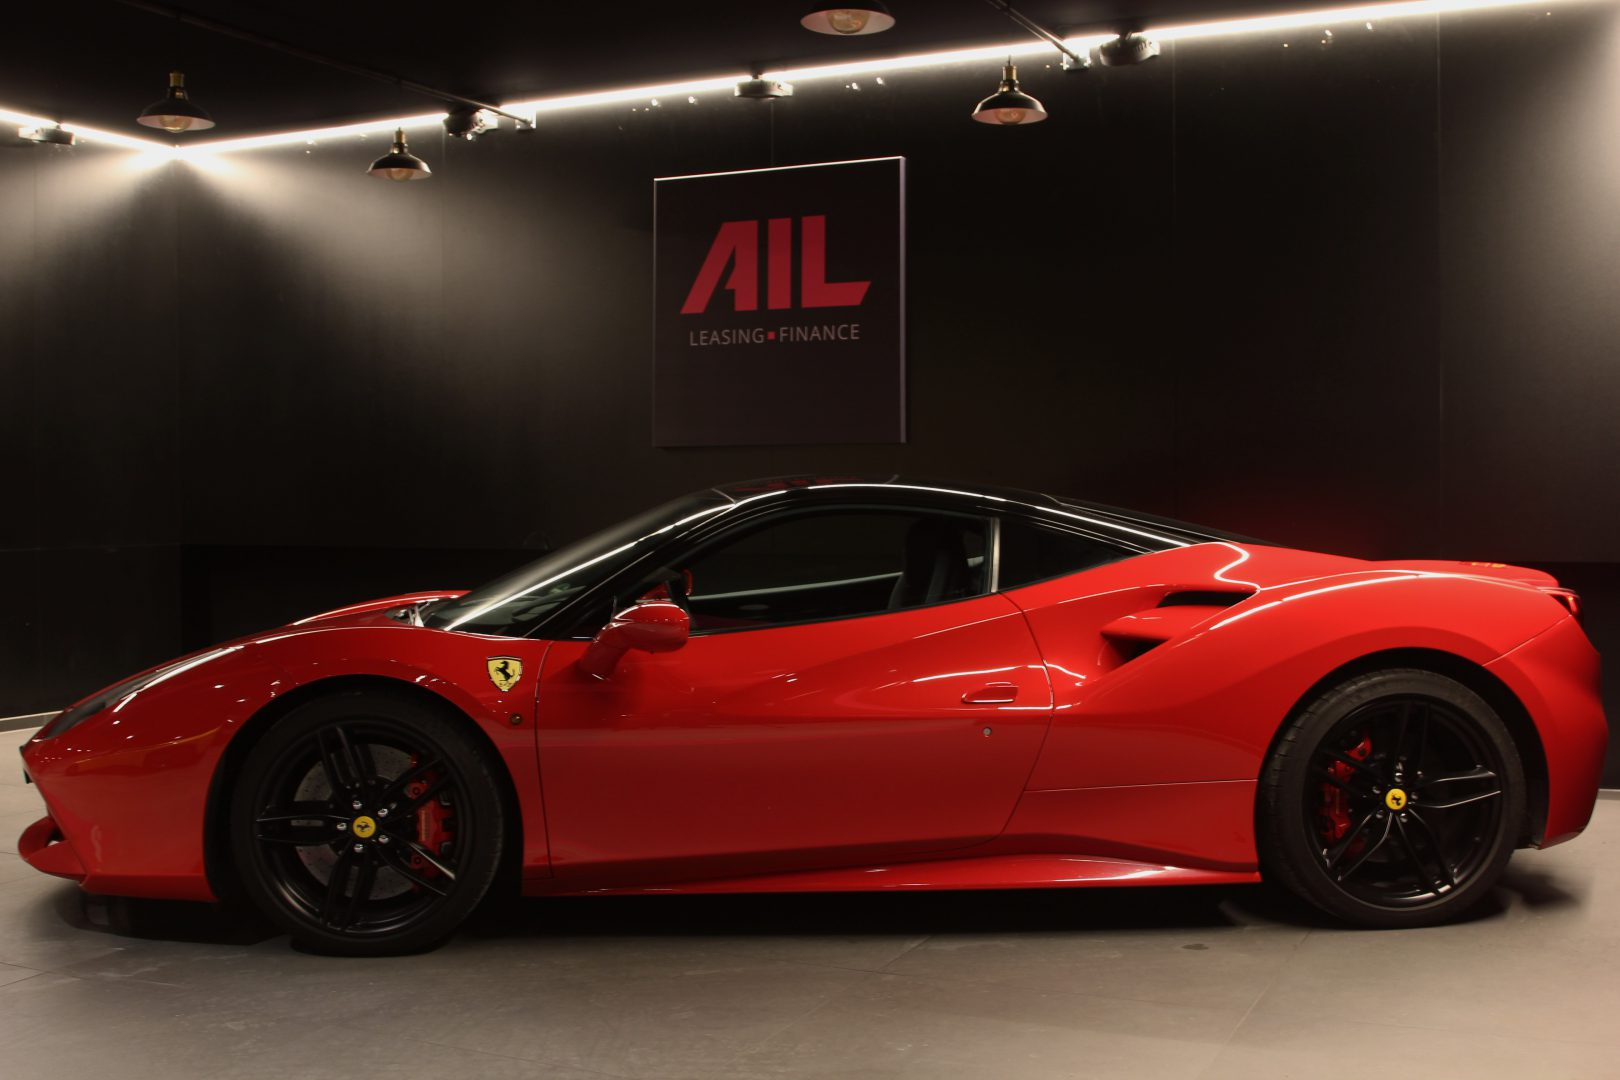 AIL Ferrari 488 GTB Rosso Corsa 10